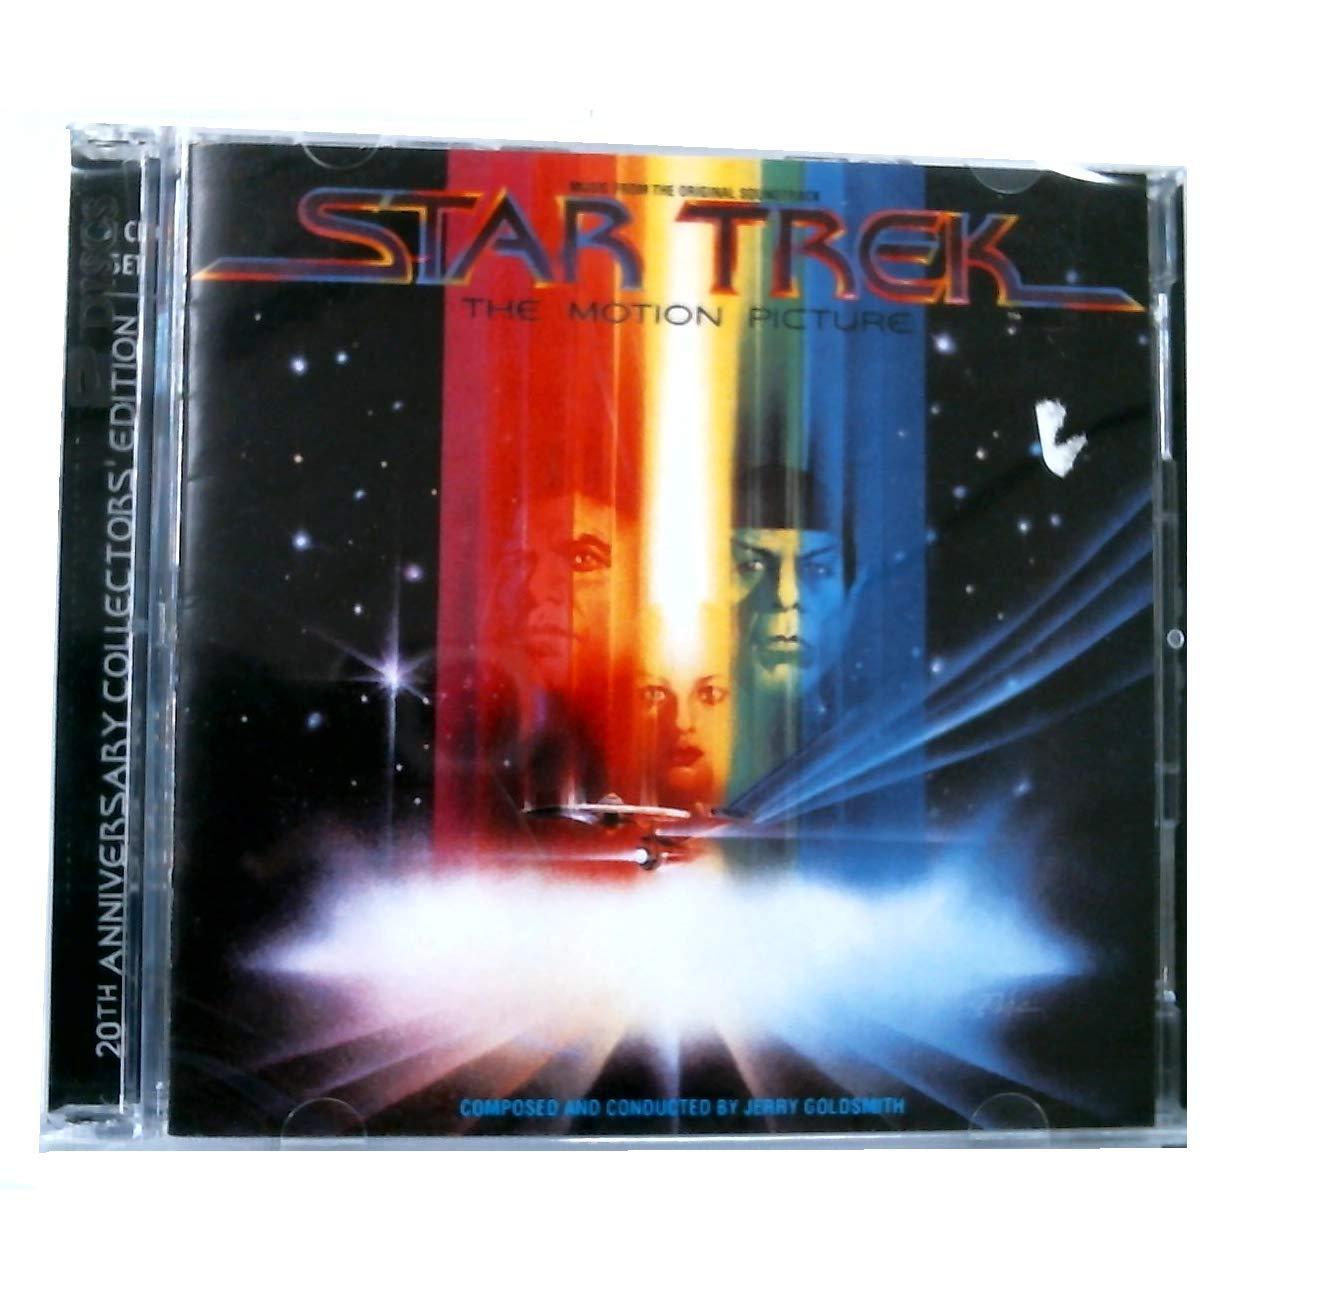 Star Trek: The Motion Picture : Gene Roddenberry, Jerry Goldsmith:  Amazon.fr: Musique